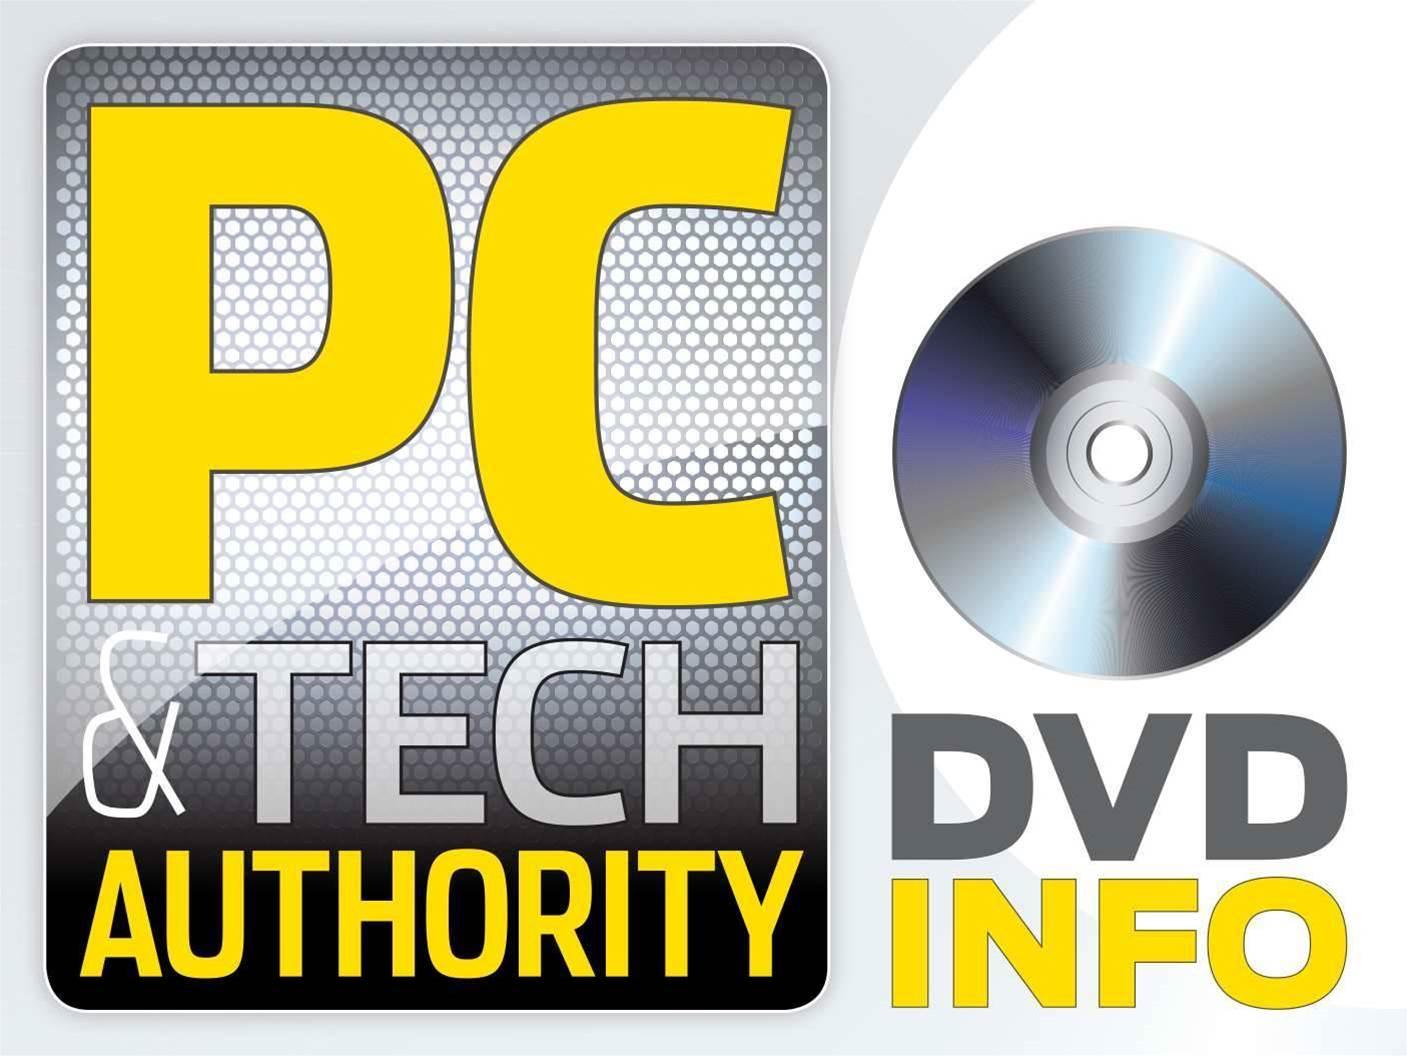 PC&TA DVD info: Cyberlink Photodirector 4